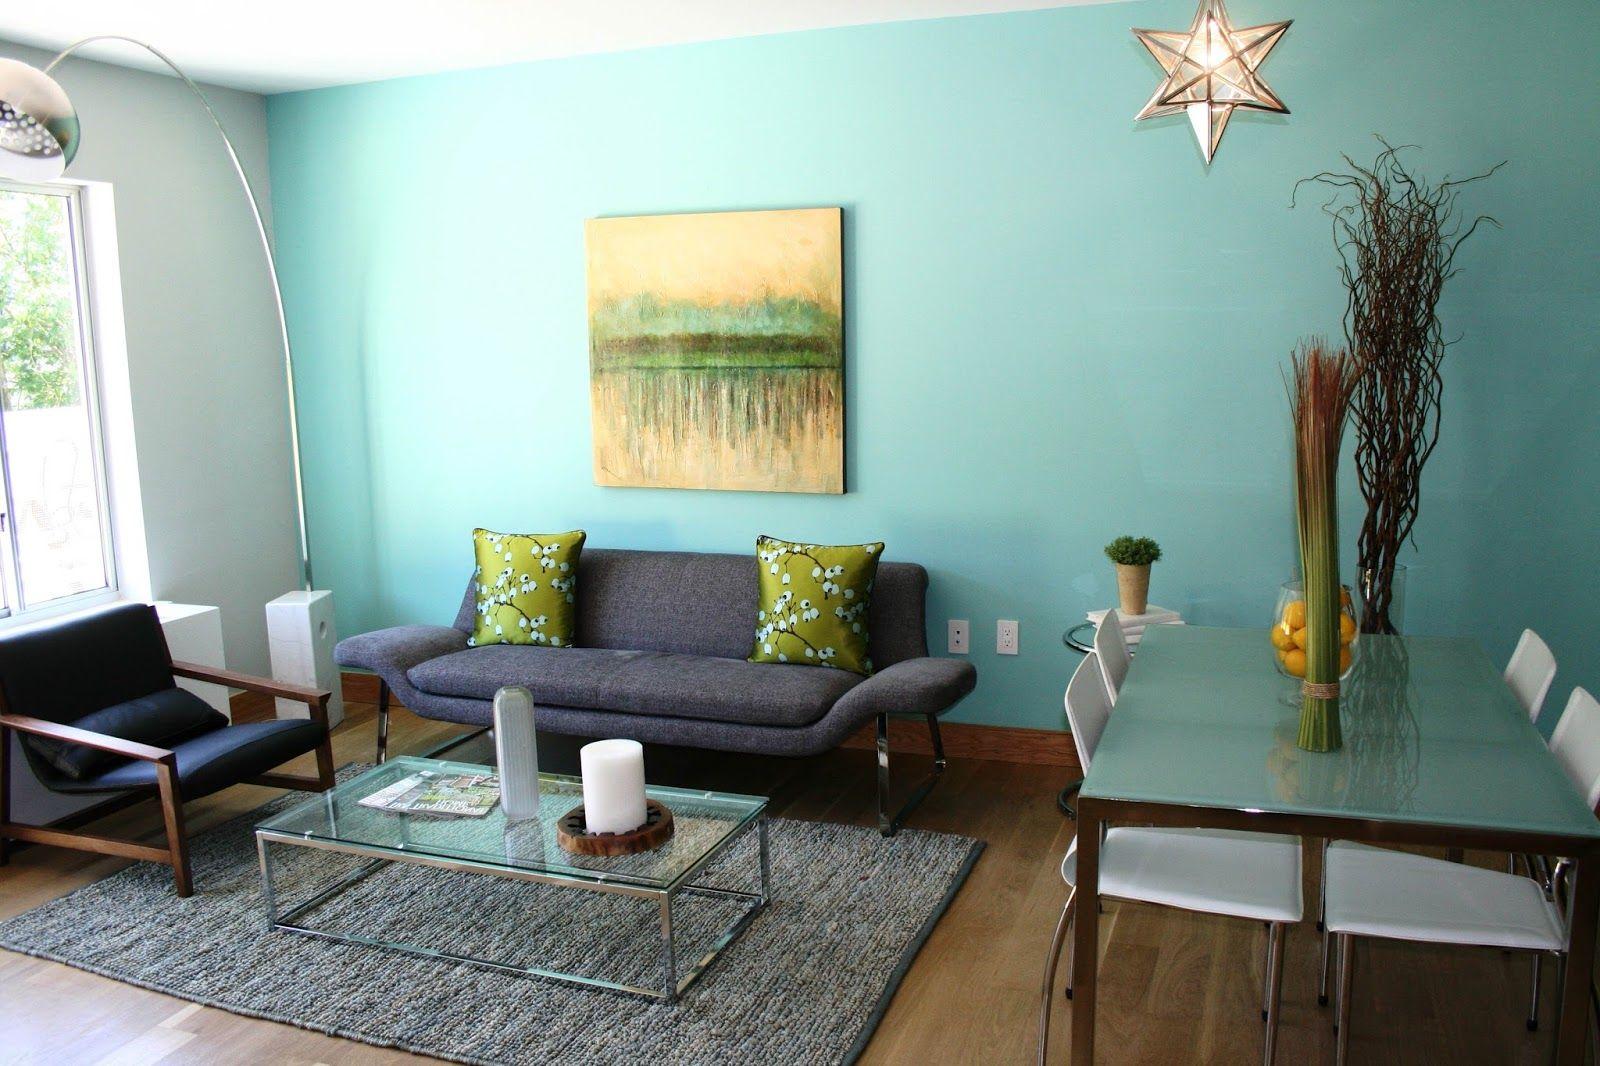 Warna Cat Tembok Ruang Tamu   18x18 Wallpaper   teahub.io